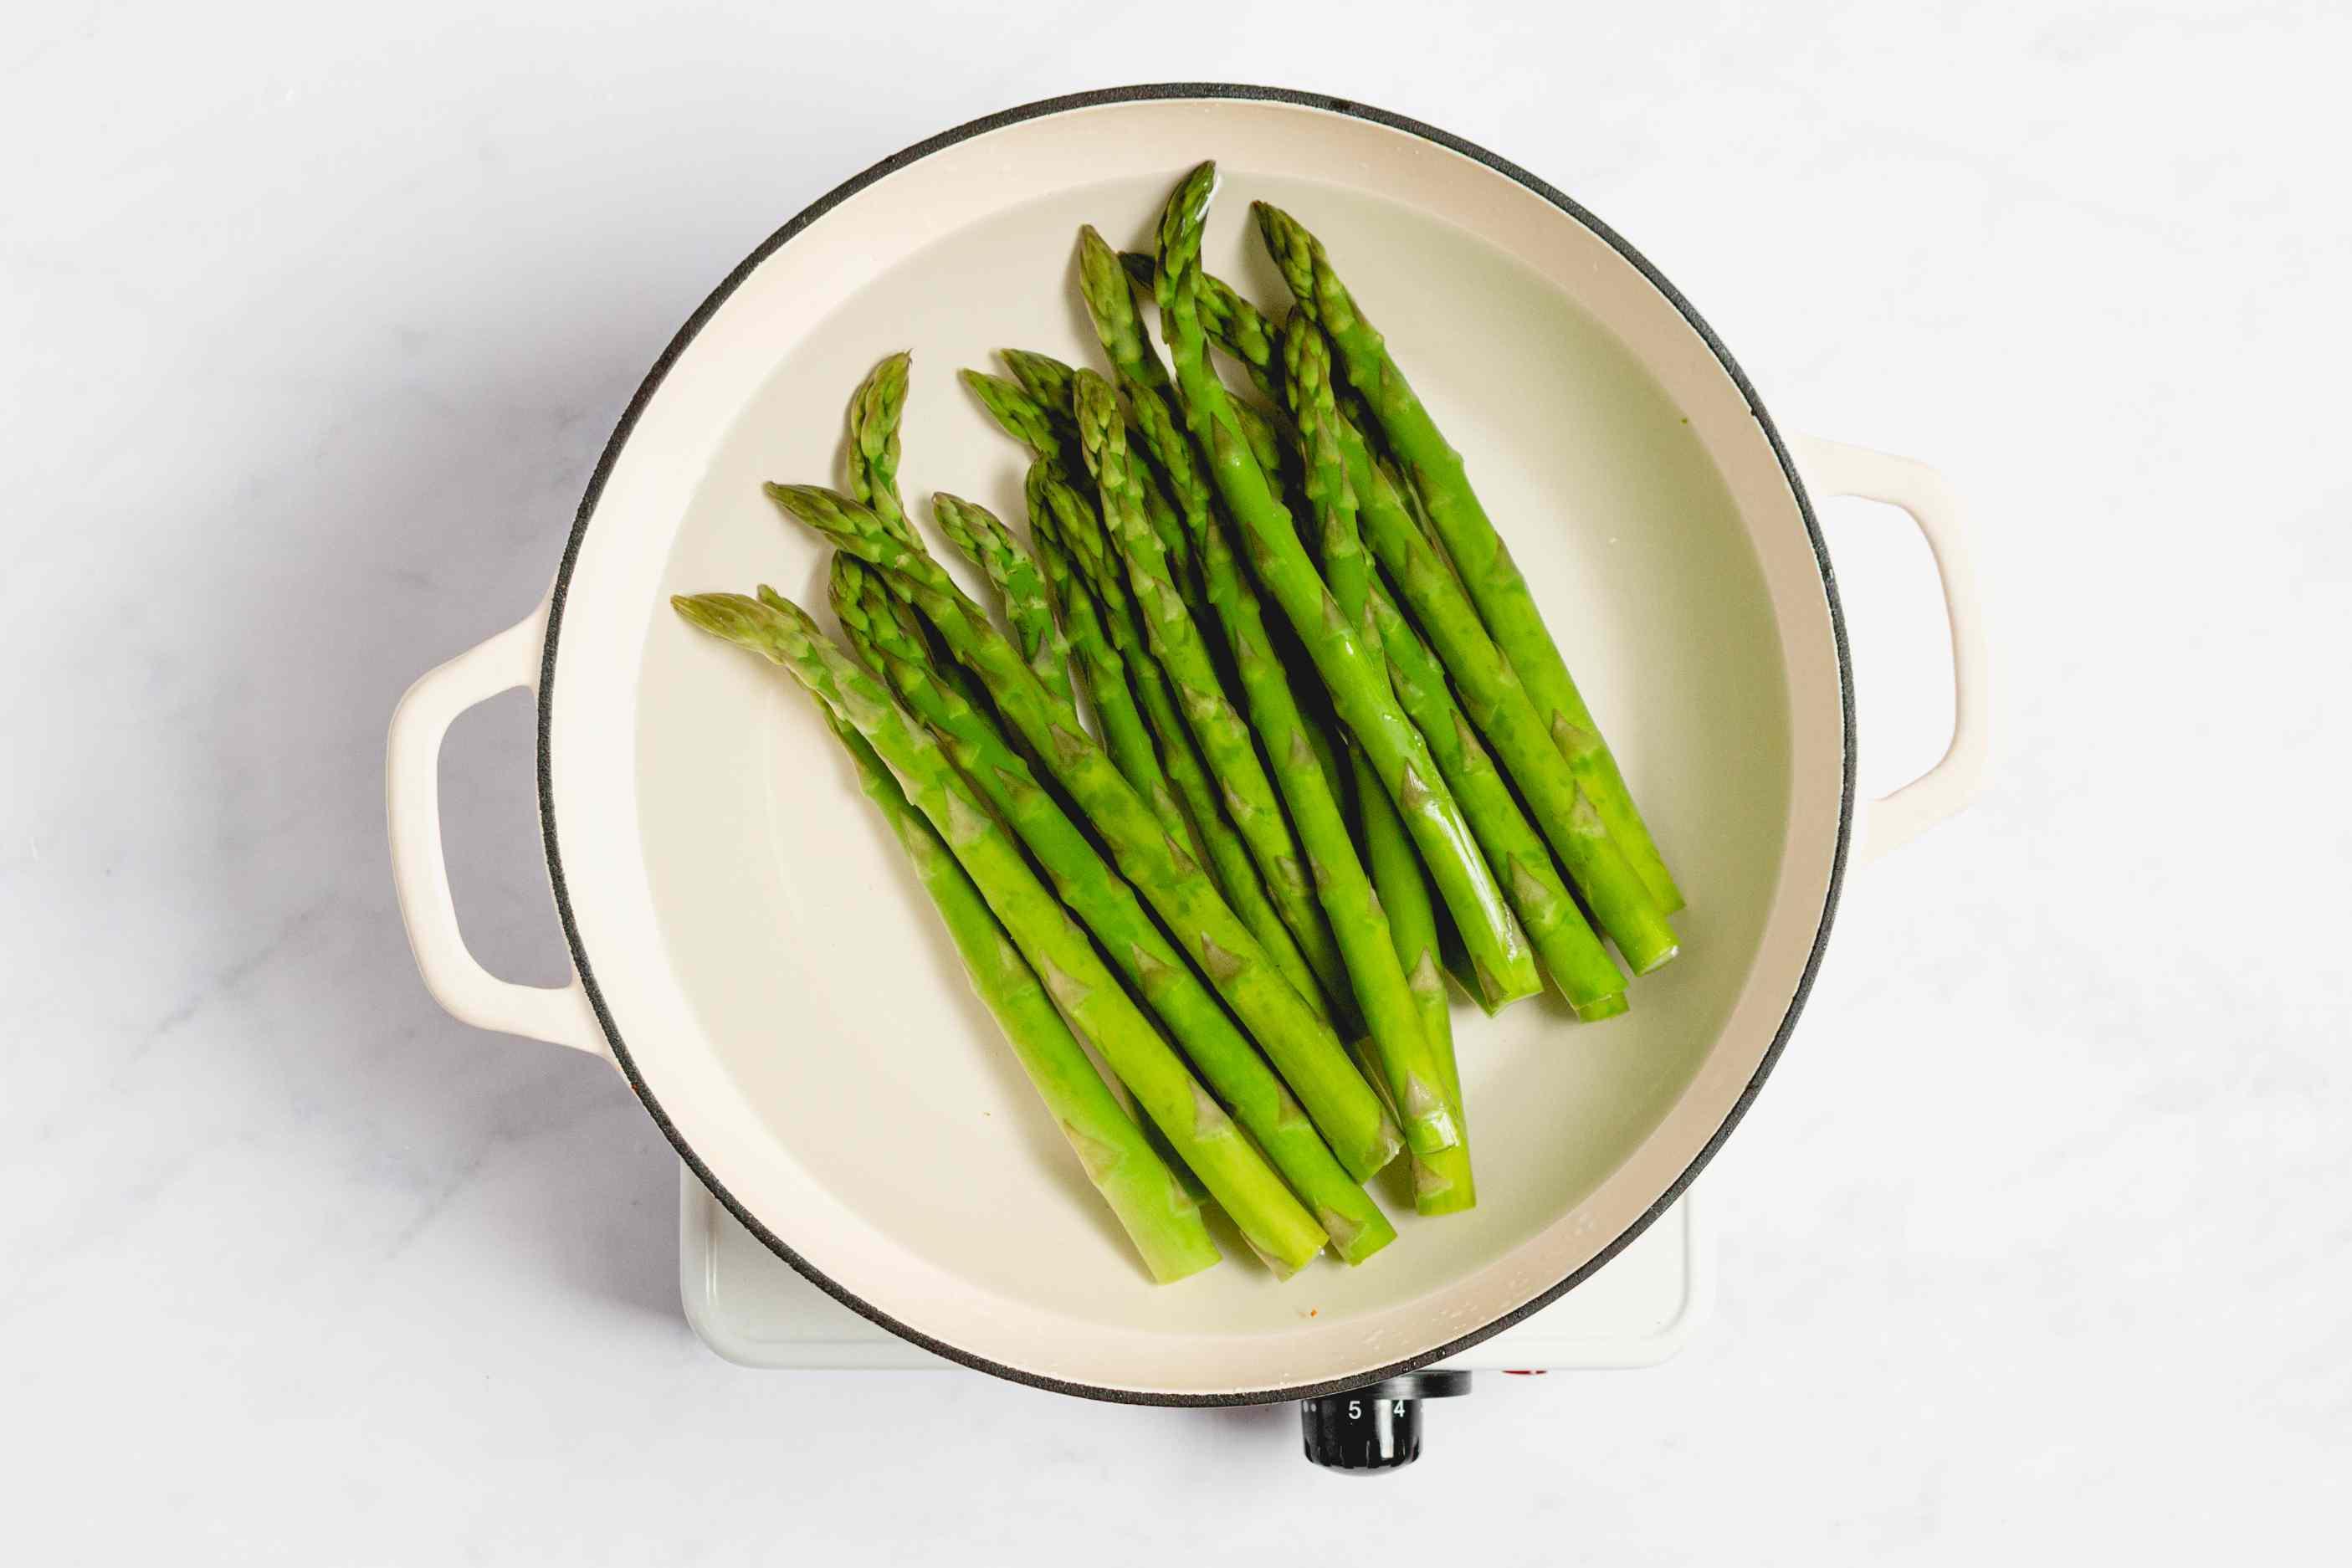 Asparagus cooking in saucepan